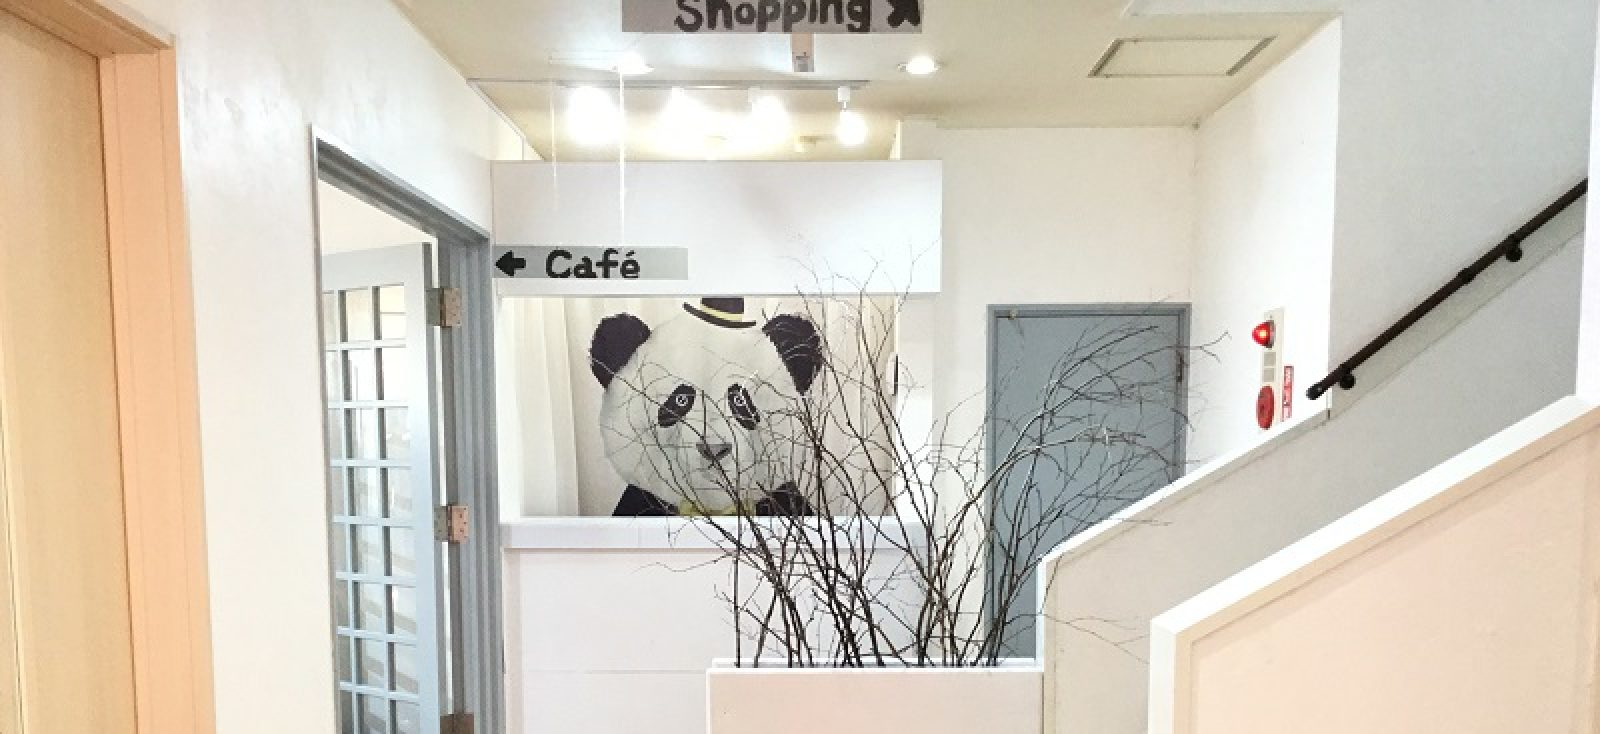 Cafe Restaurant & Shopping|Hana-Japan Project